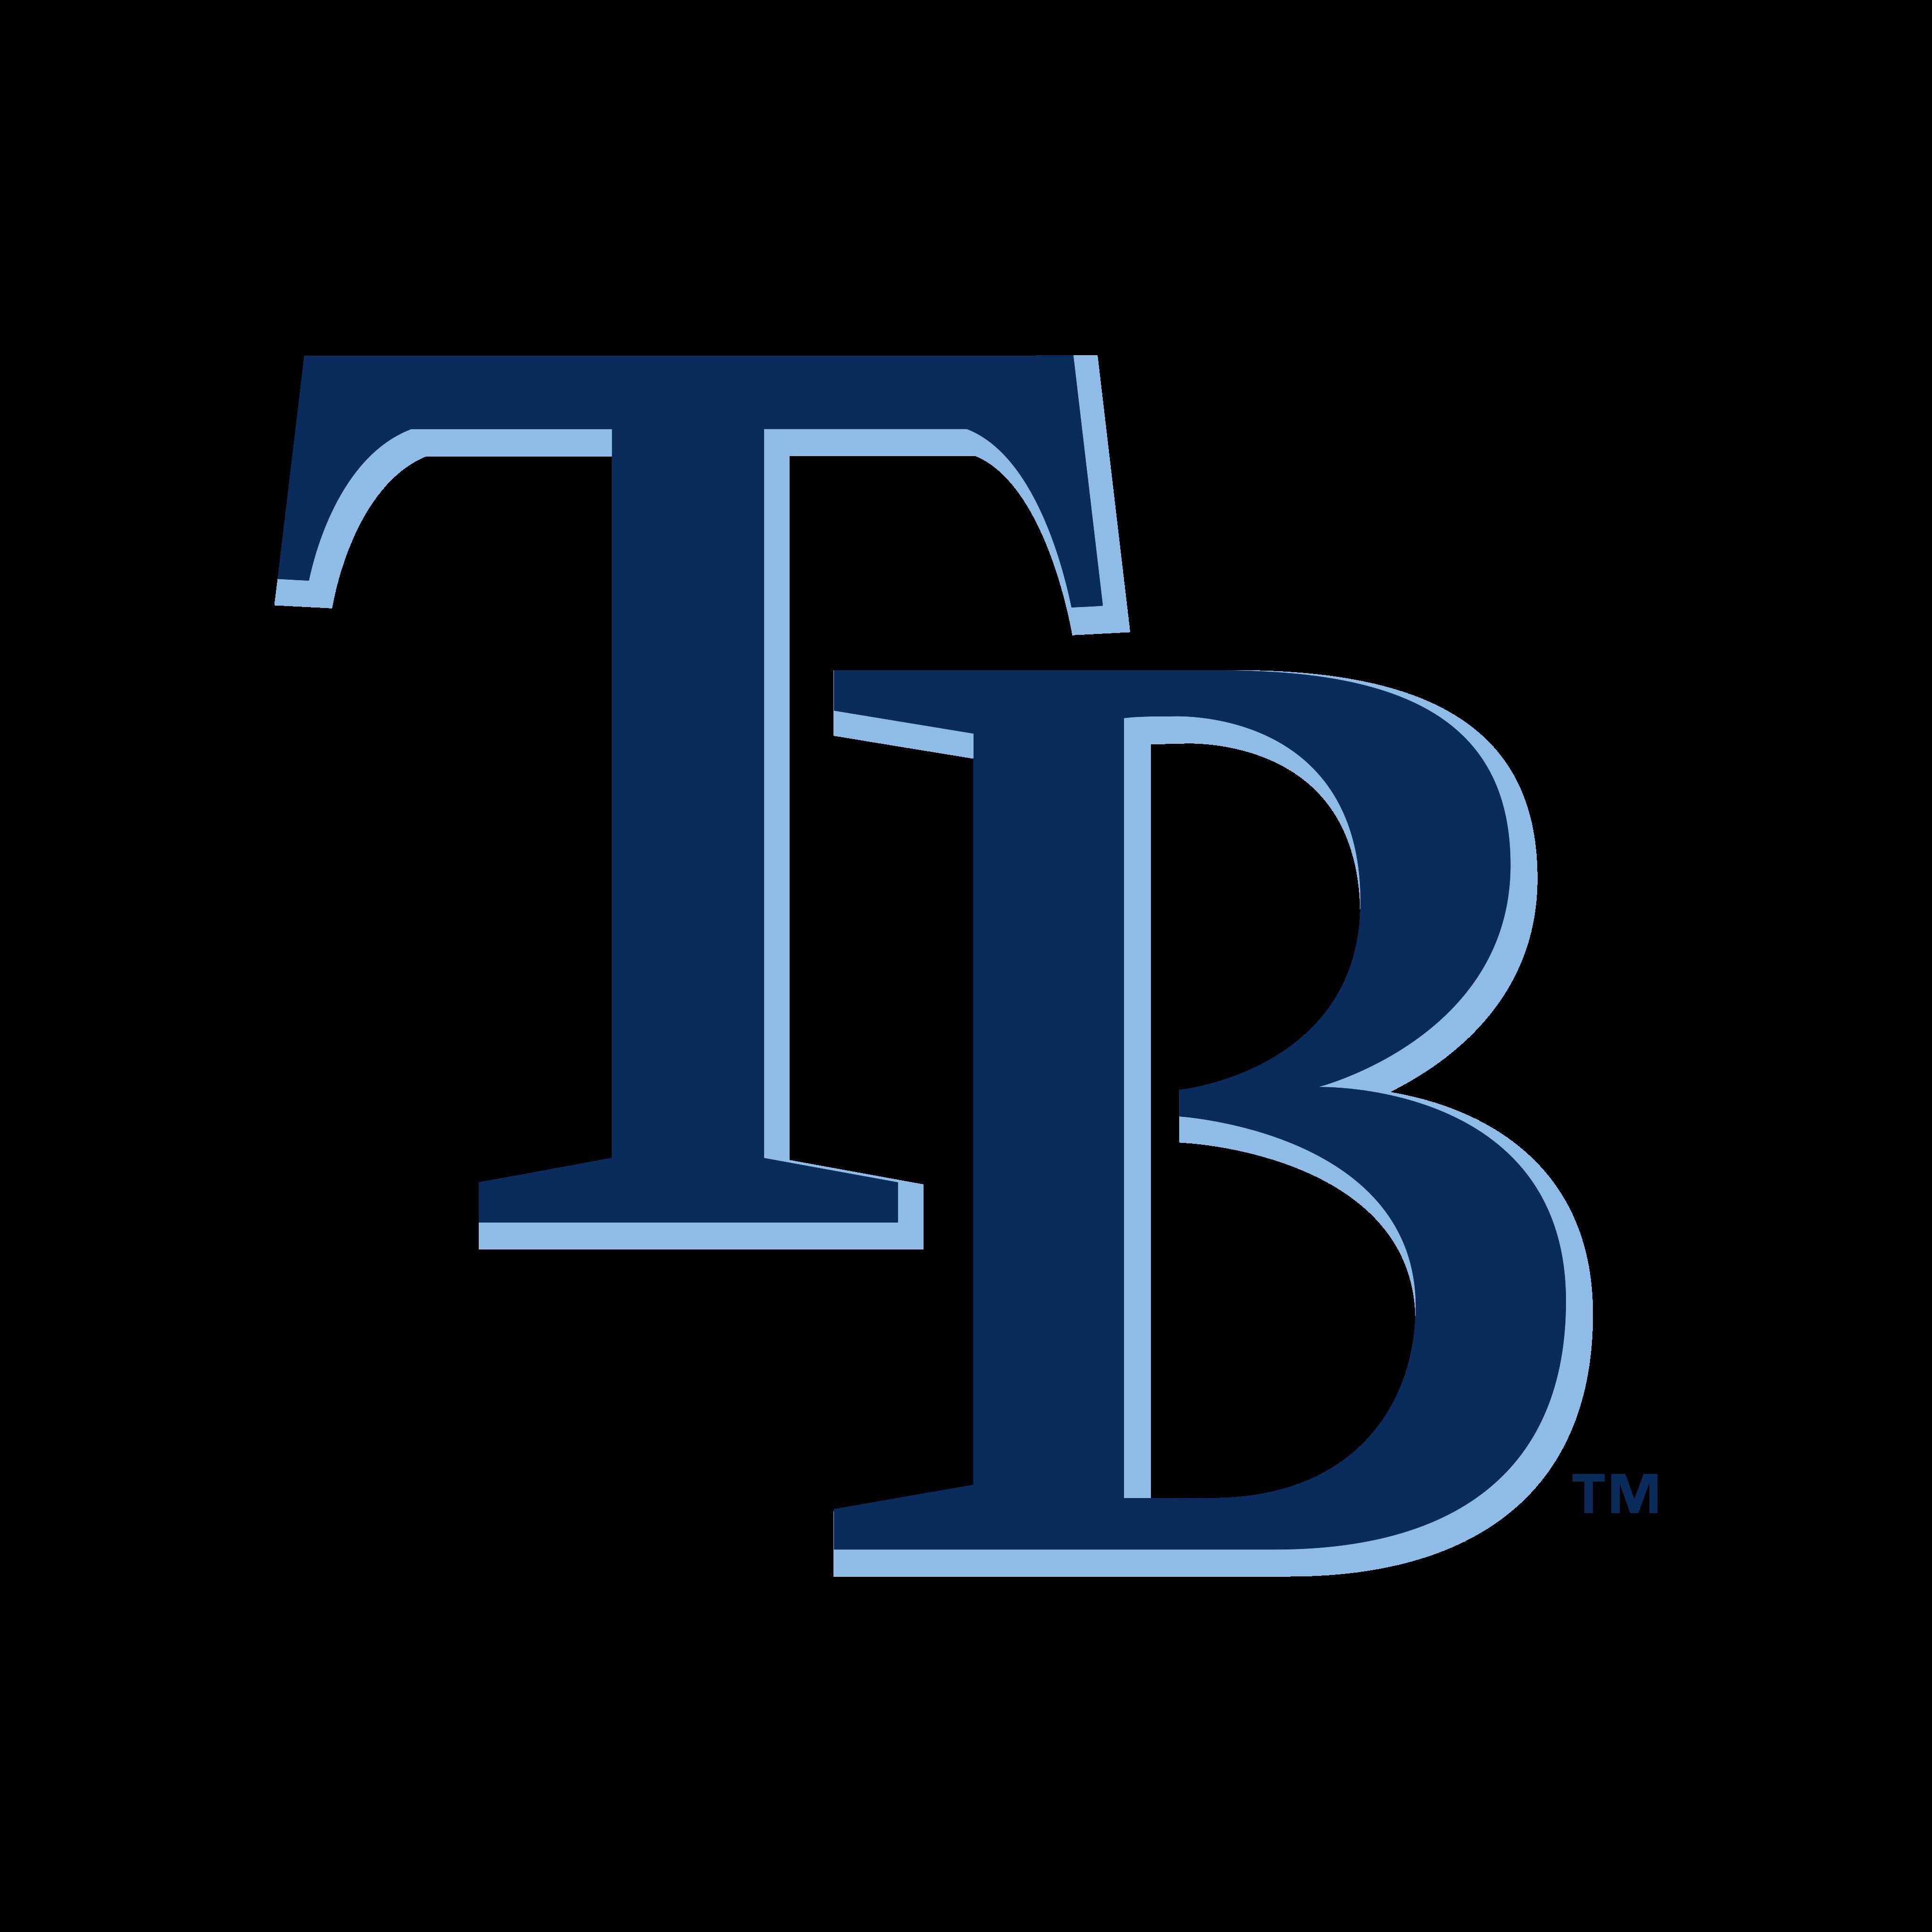 tampa bay rays logo 0 - Tampa Bay Rays Logo